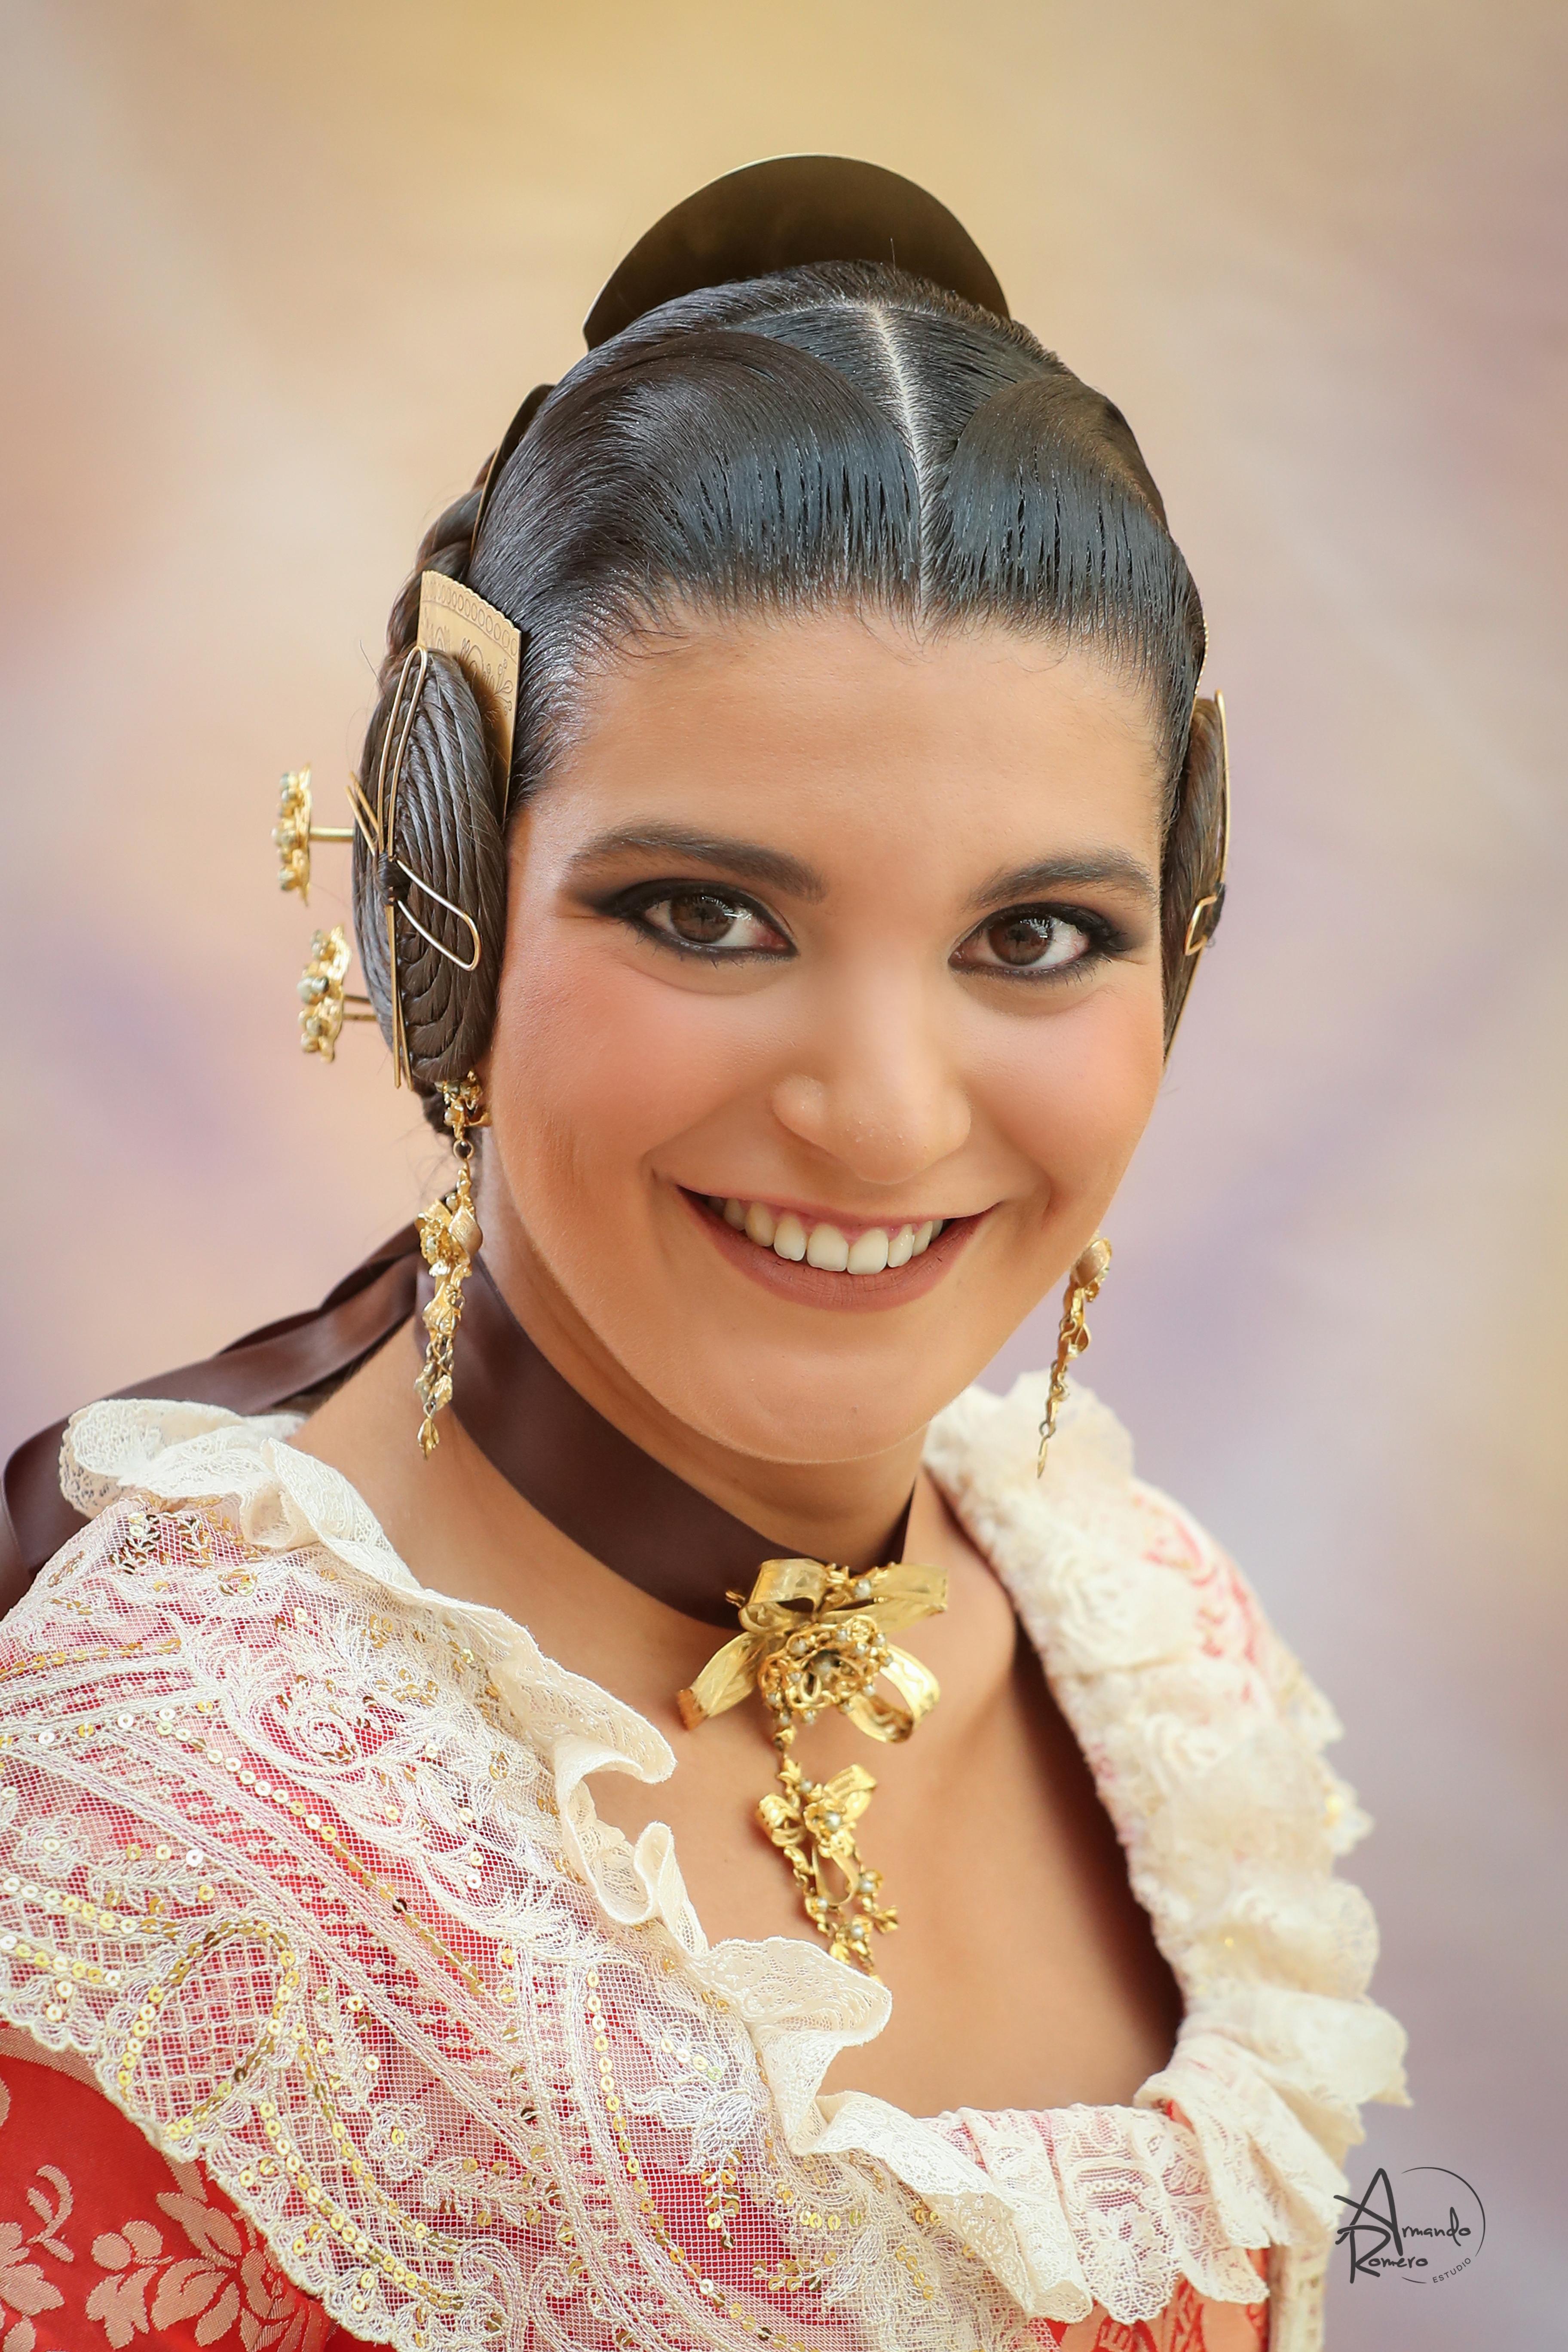 Raquel Sobrino Oliver